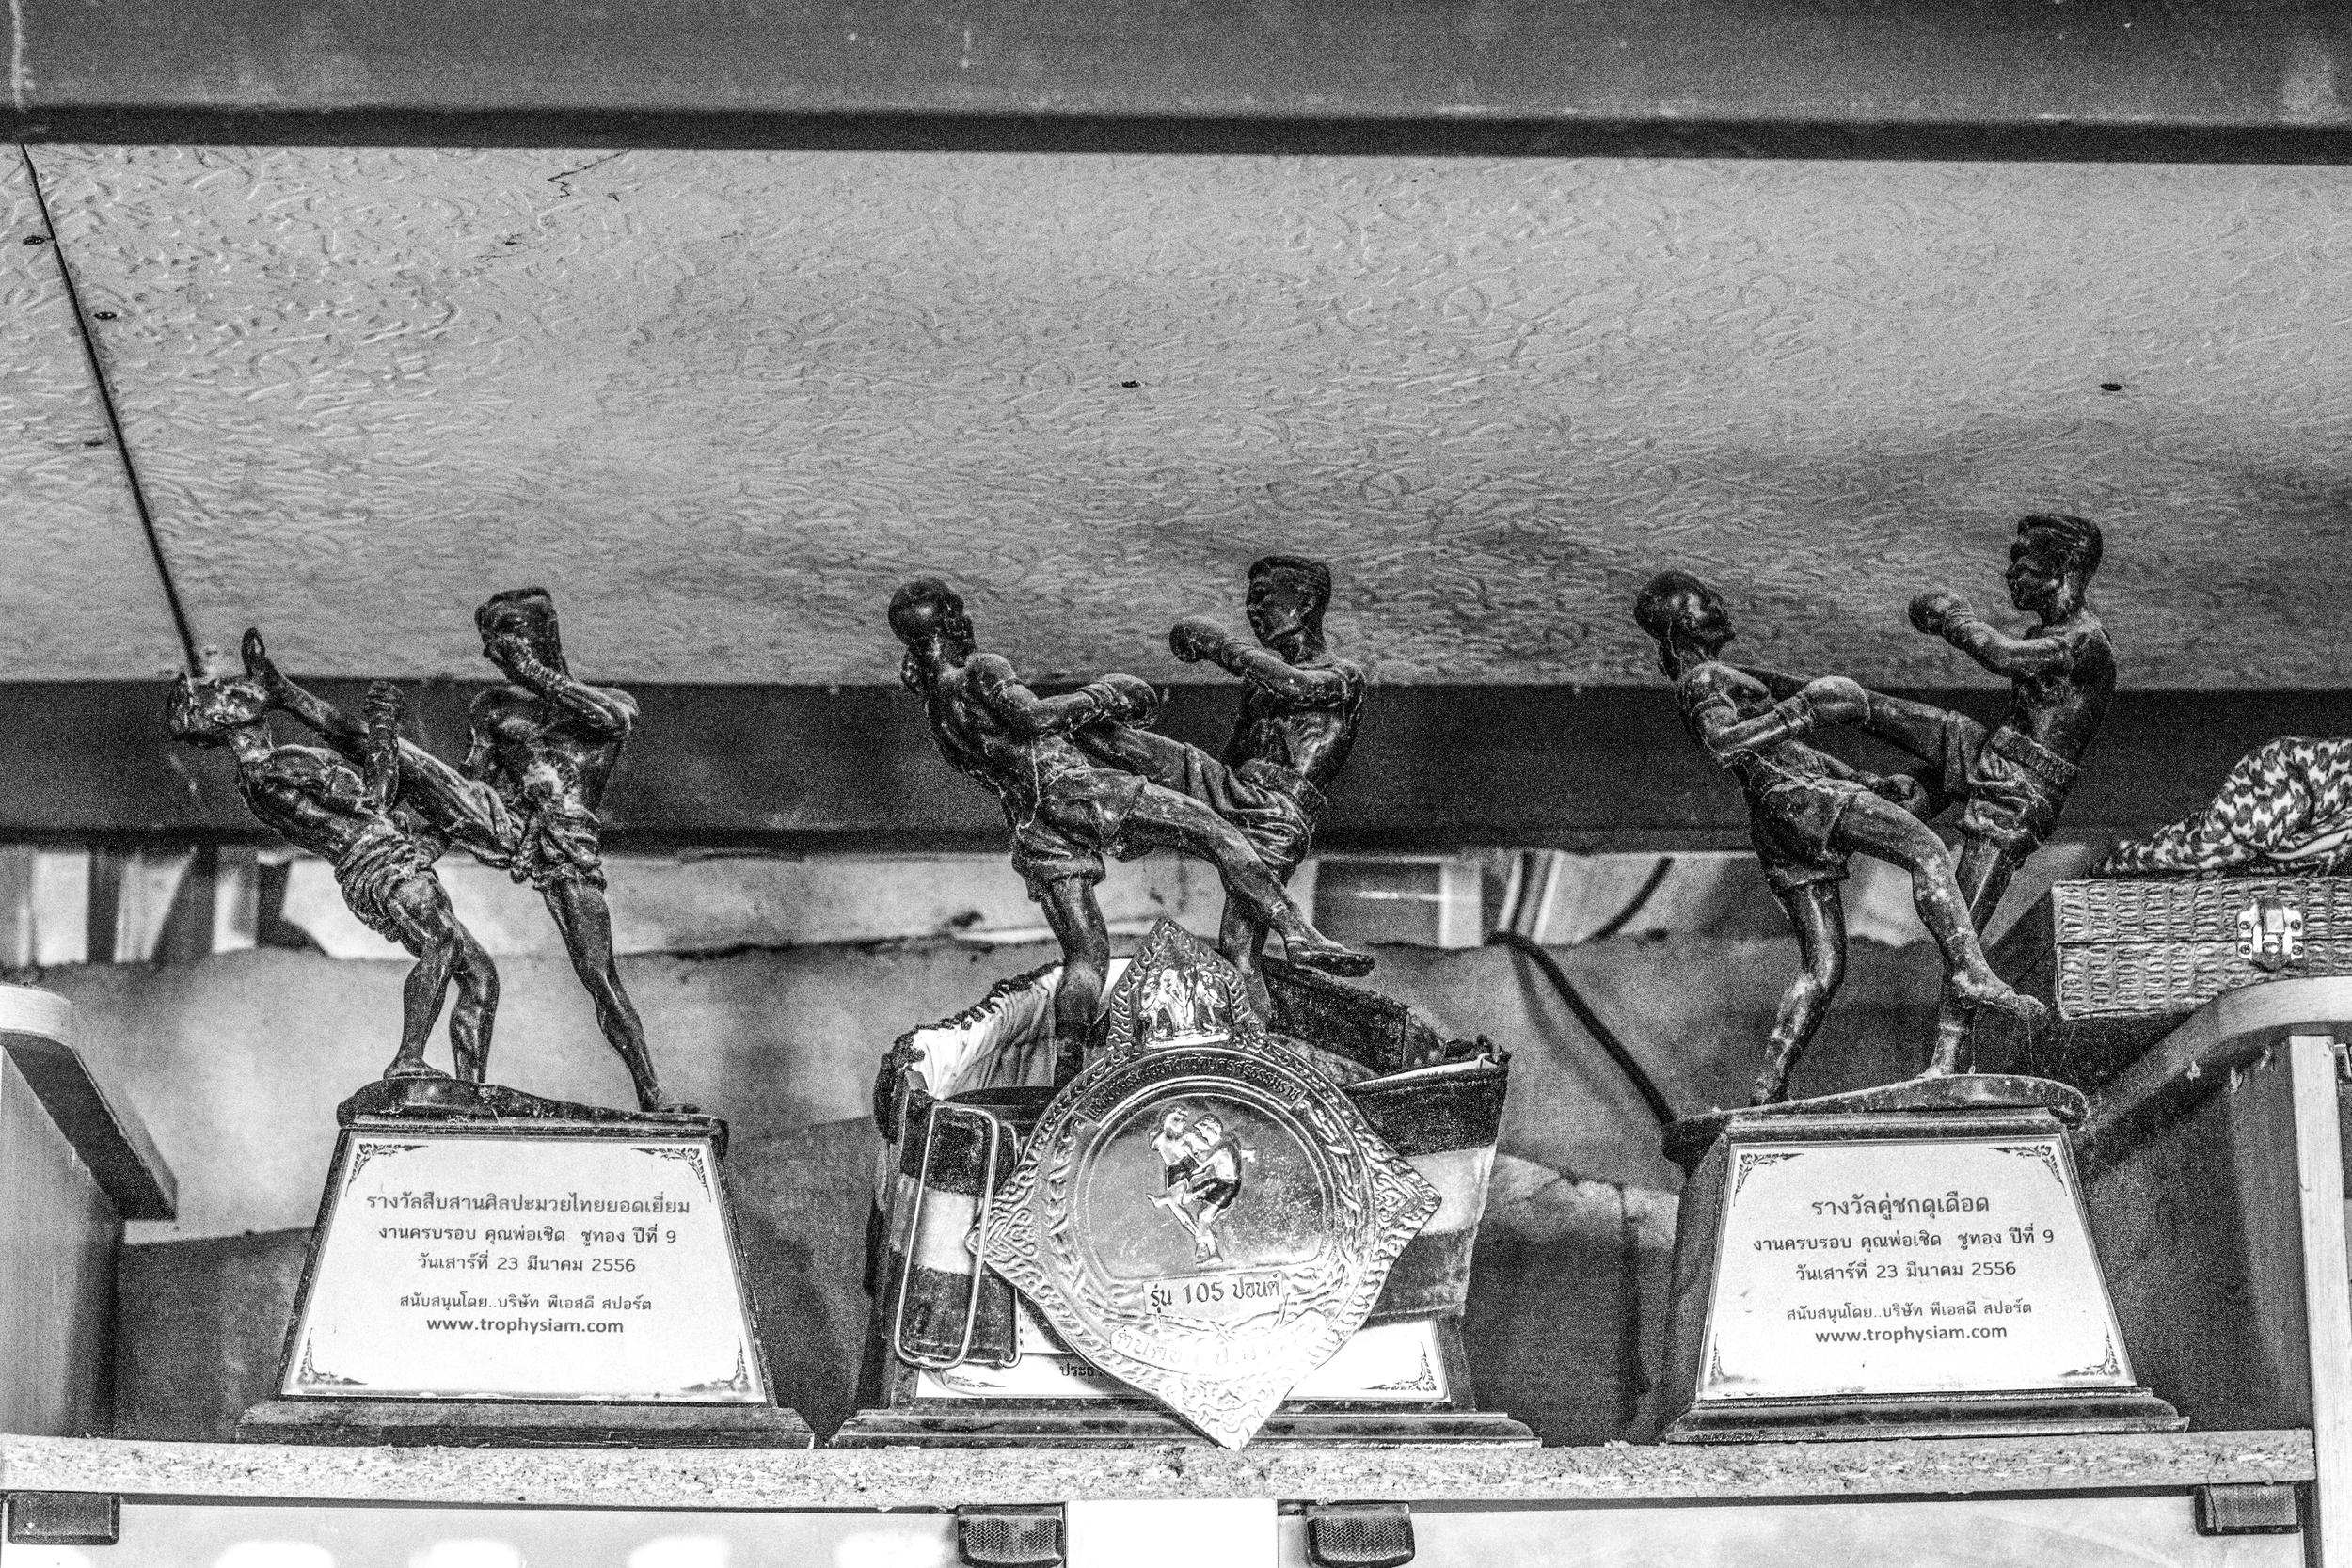 Trophies (July 11, 2014 - Tha Sala, Thailand)